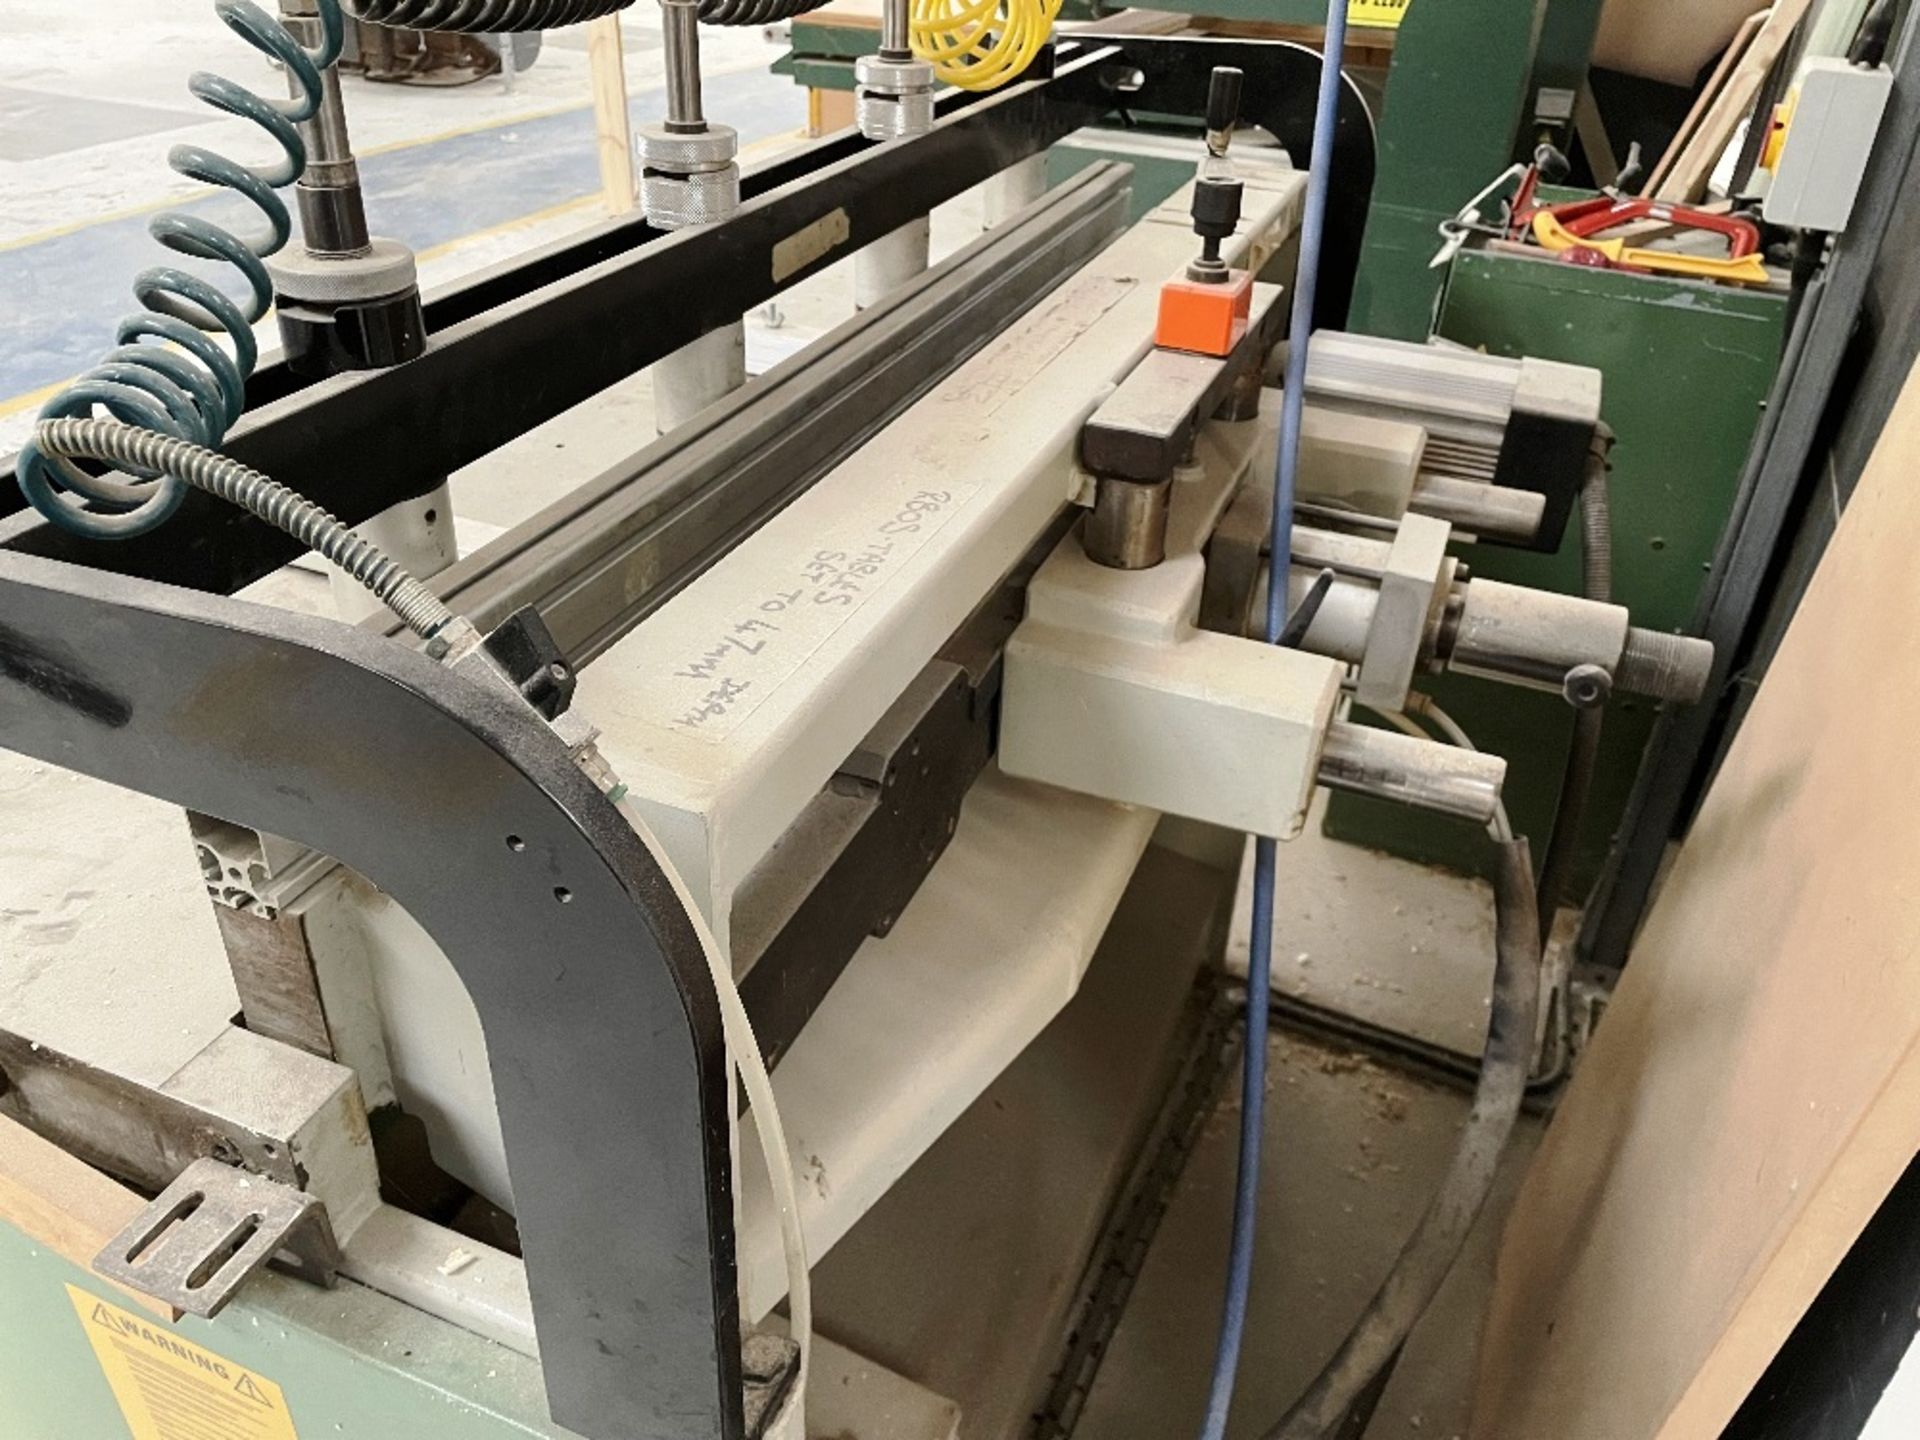 Maggi 3532 4 Head Boring Machine w/ Tool Cabinet & Tooling | YOM: 1999 - Image 7 of 12